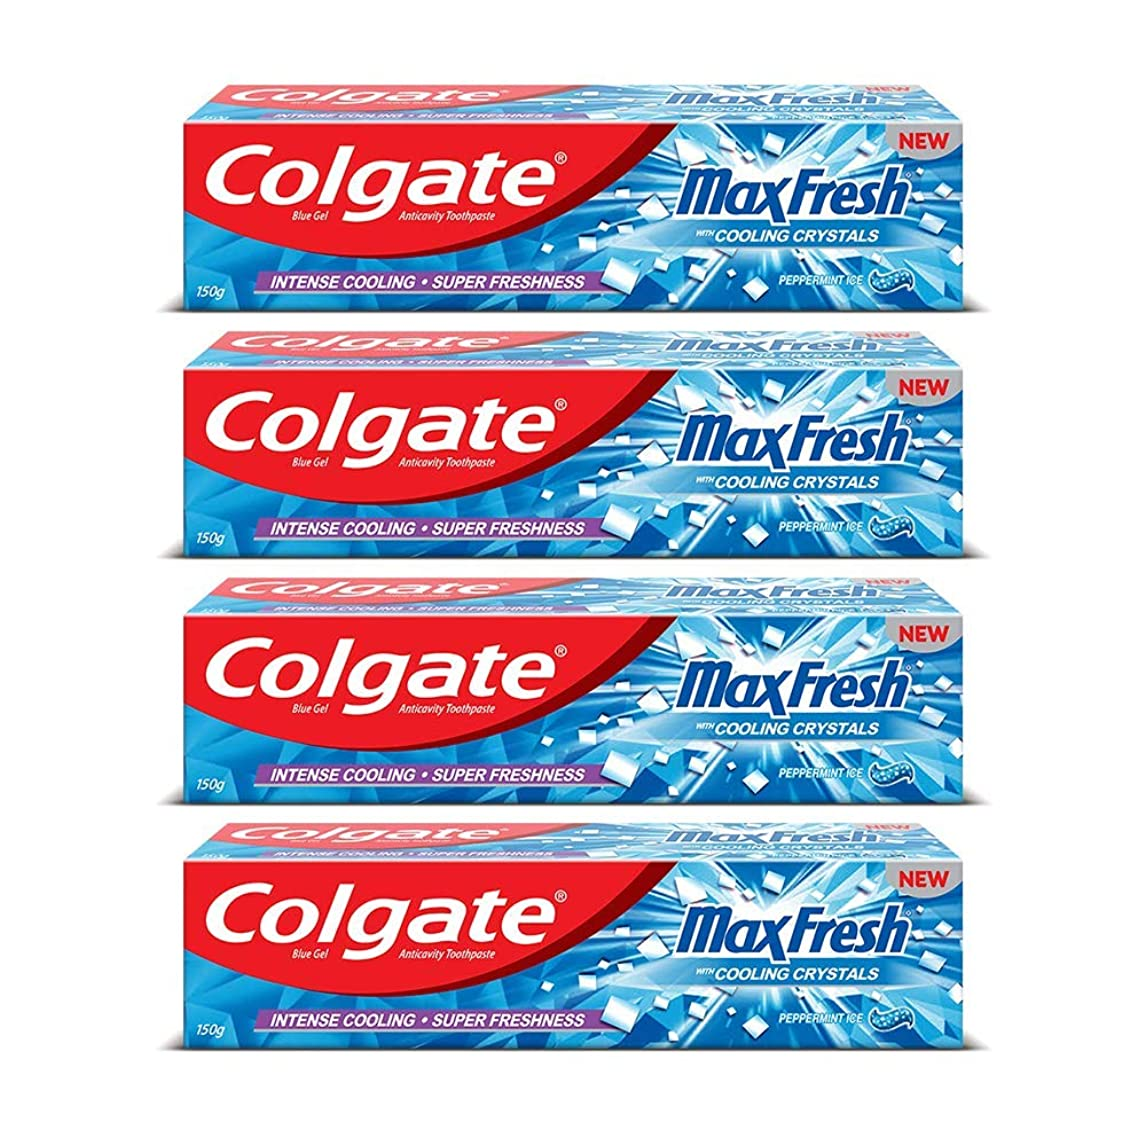 時代遅れ暴君白雪姫Colgate Max Fresh Anti-Cavity Toothpaste, Peppermint Ice, 150gm (Pack of 4)